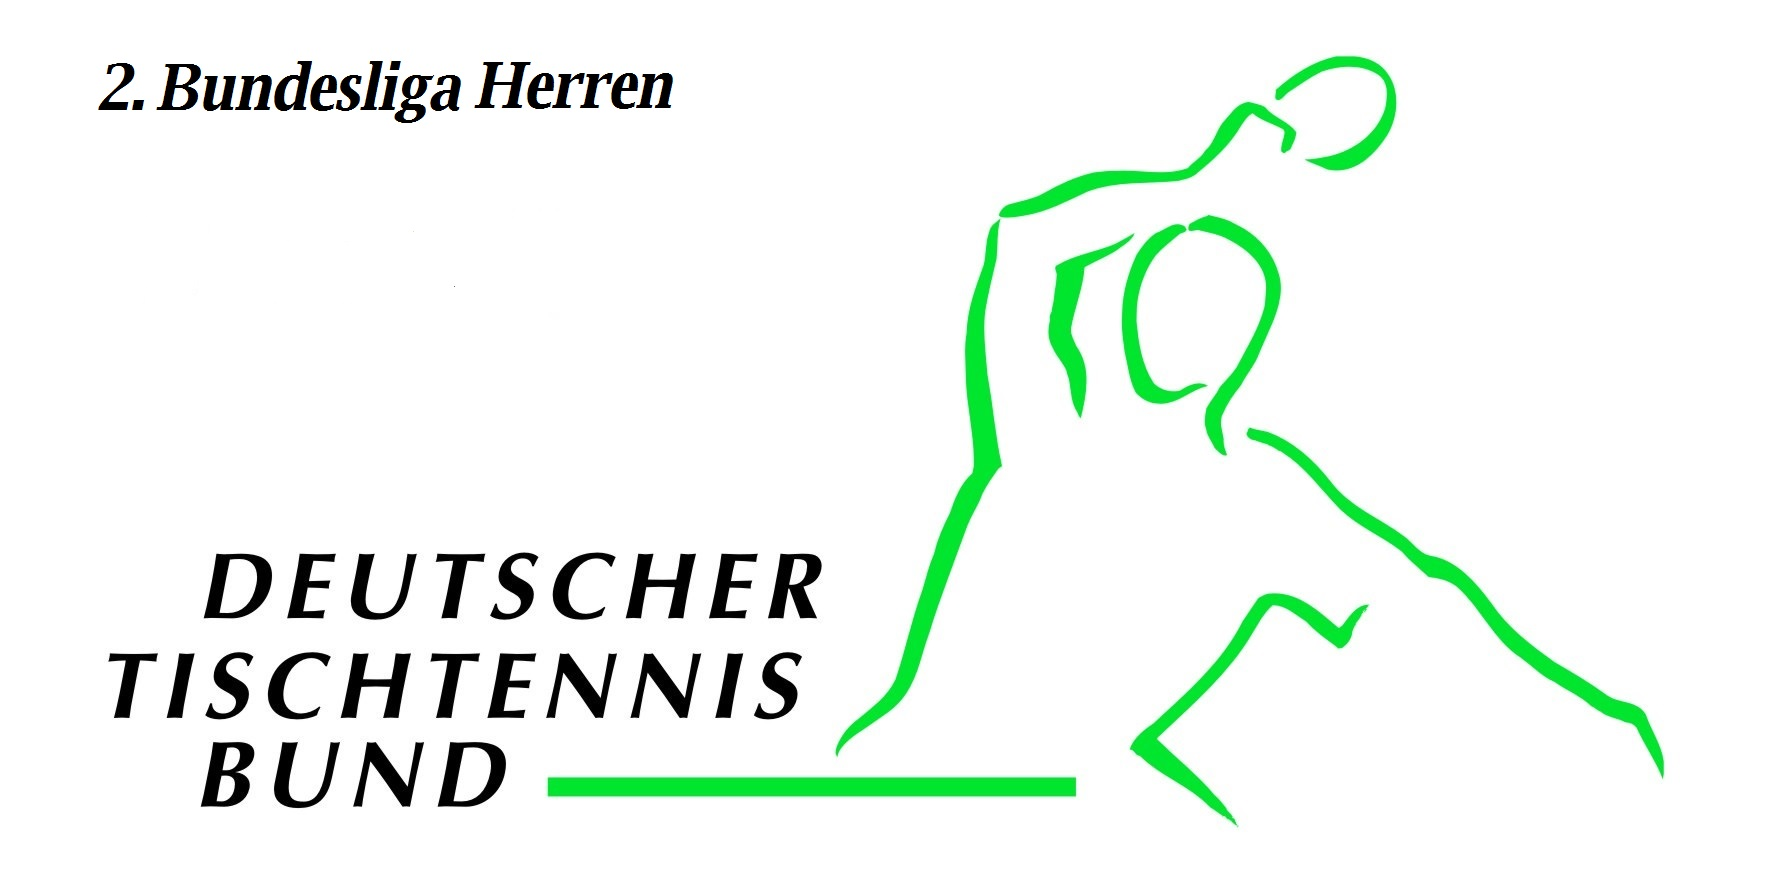 /artikel/14-15/DTTB 2. Bundesliga Herren.jpg